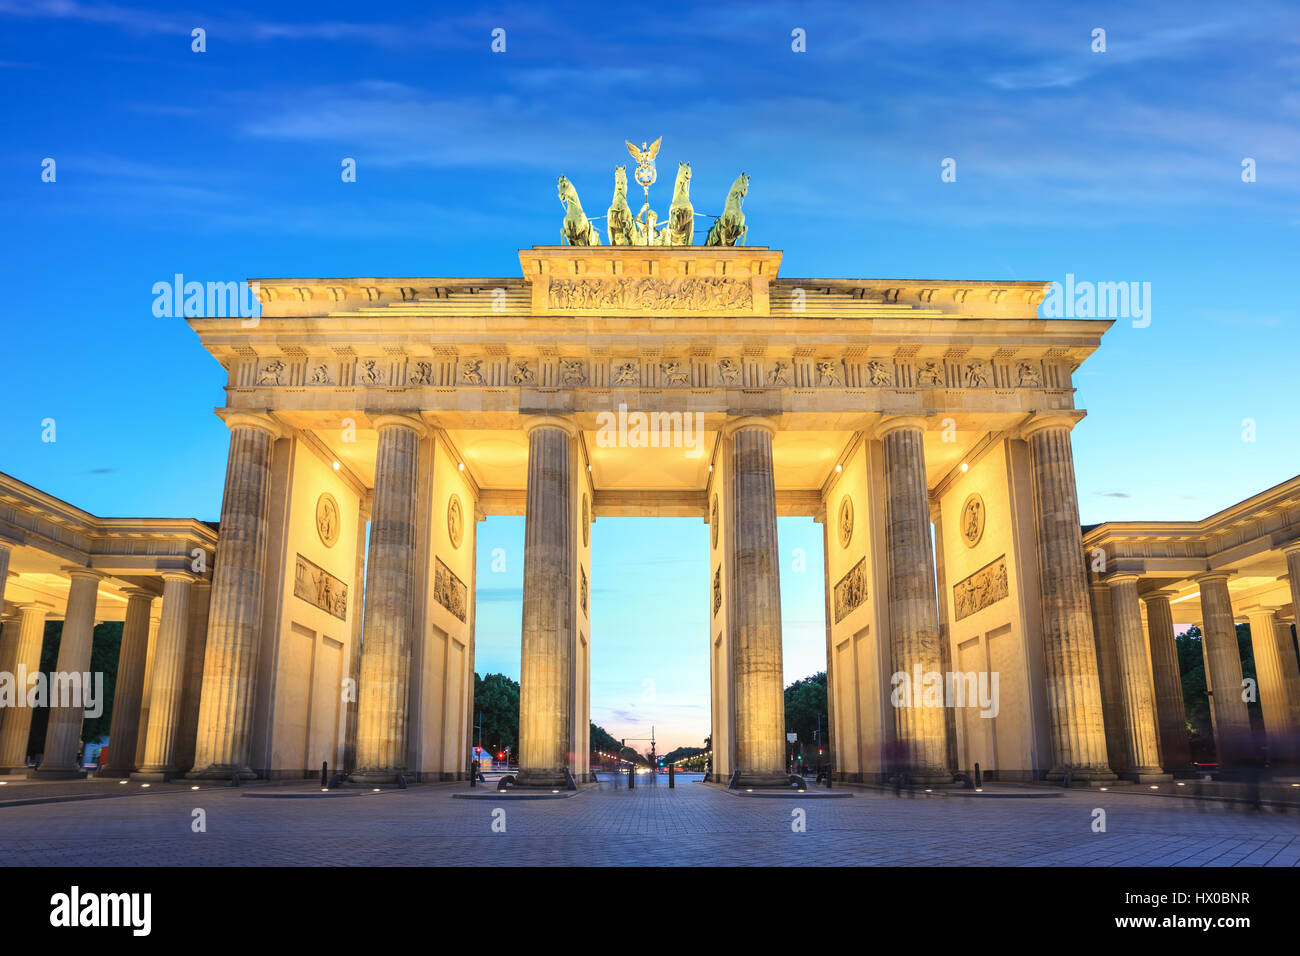 Brandenburg Gate at night, Berlin, Germany - Stock Image